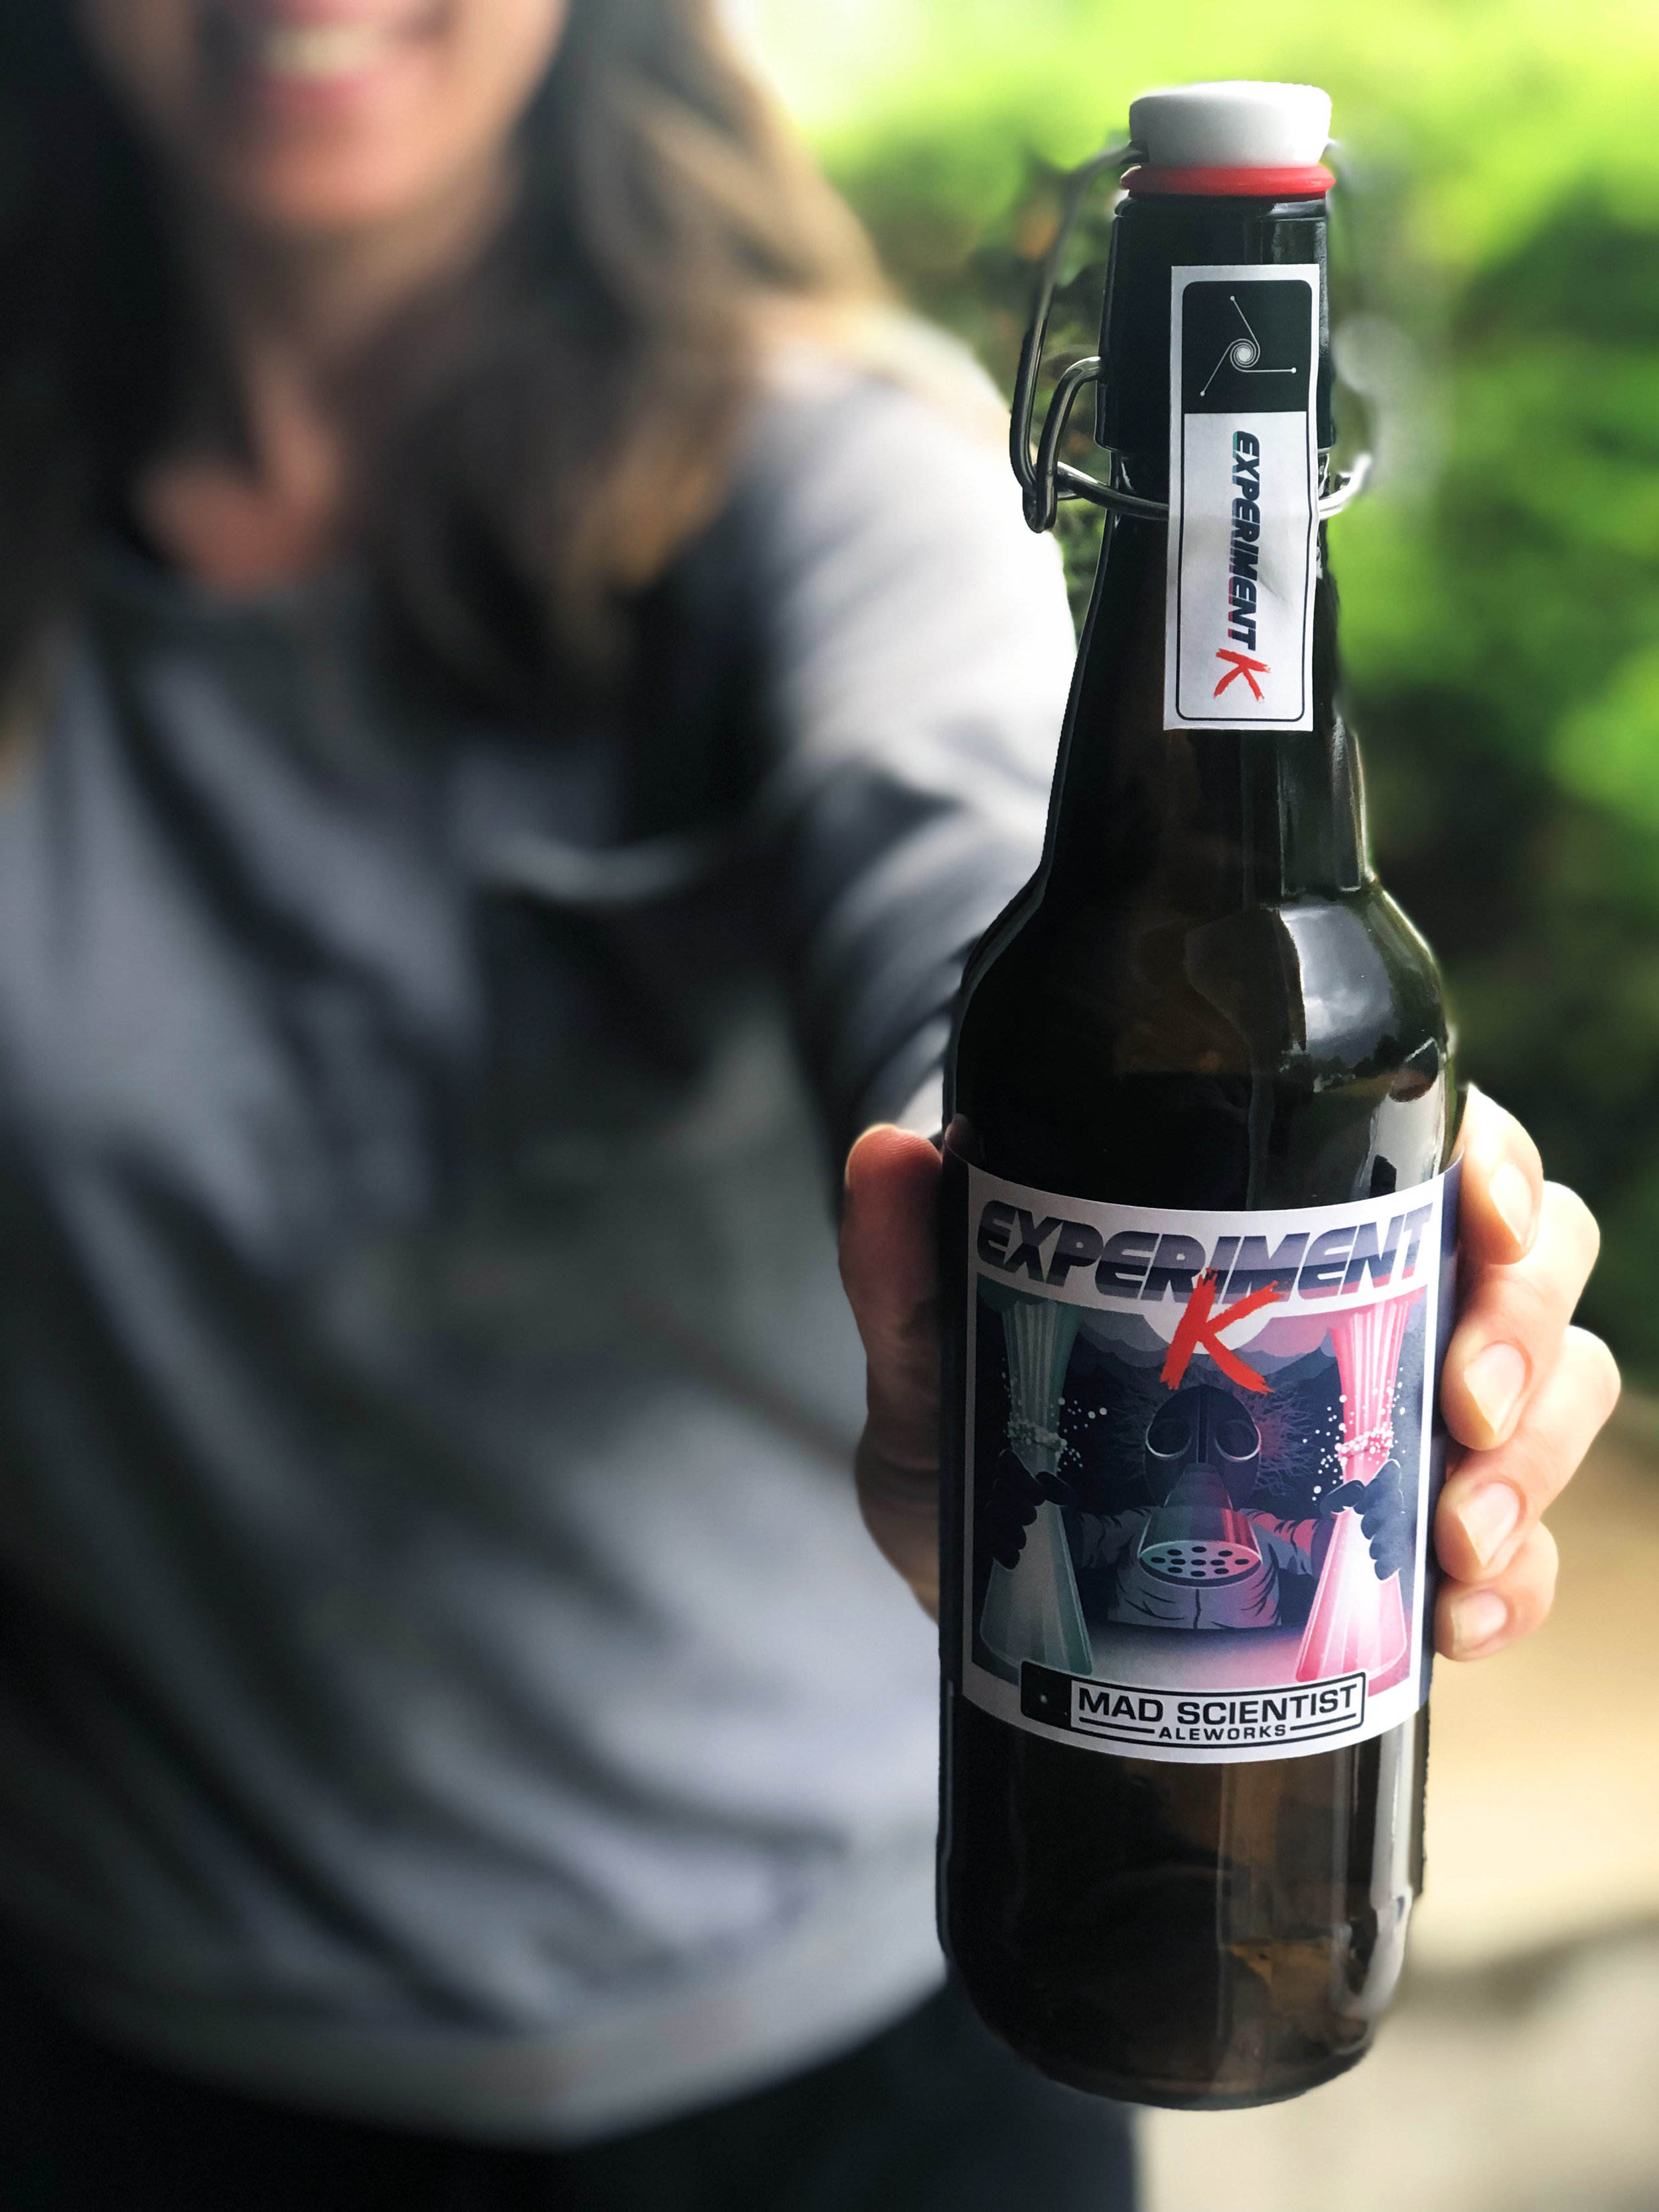 experimen-k-bottle-model-brewery-branding-beer-label-design-brand-kyle-dolan-graphi-illustration-ale-american-kolsch-01.JPG